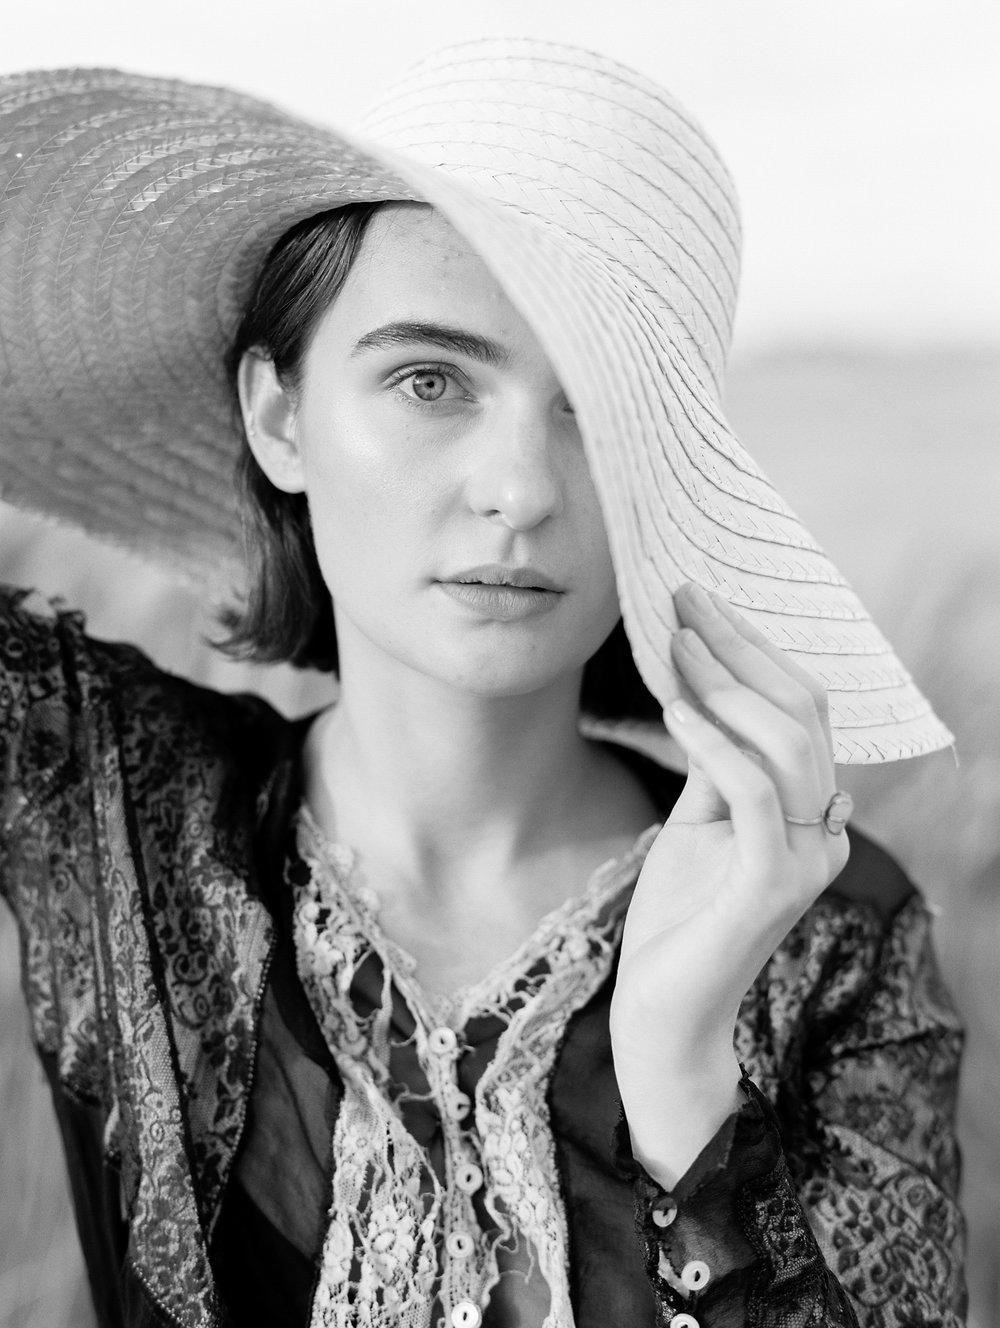 film-editorial-vintage-black-dress_0070-2.jpg